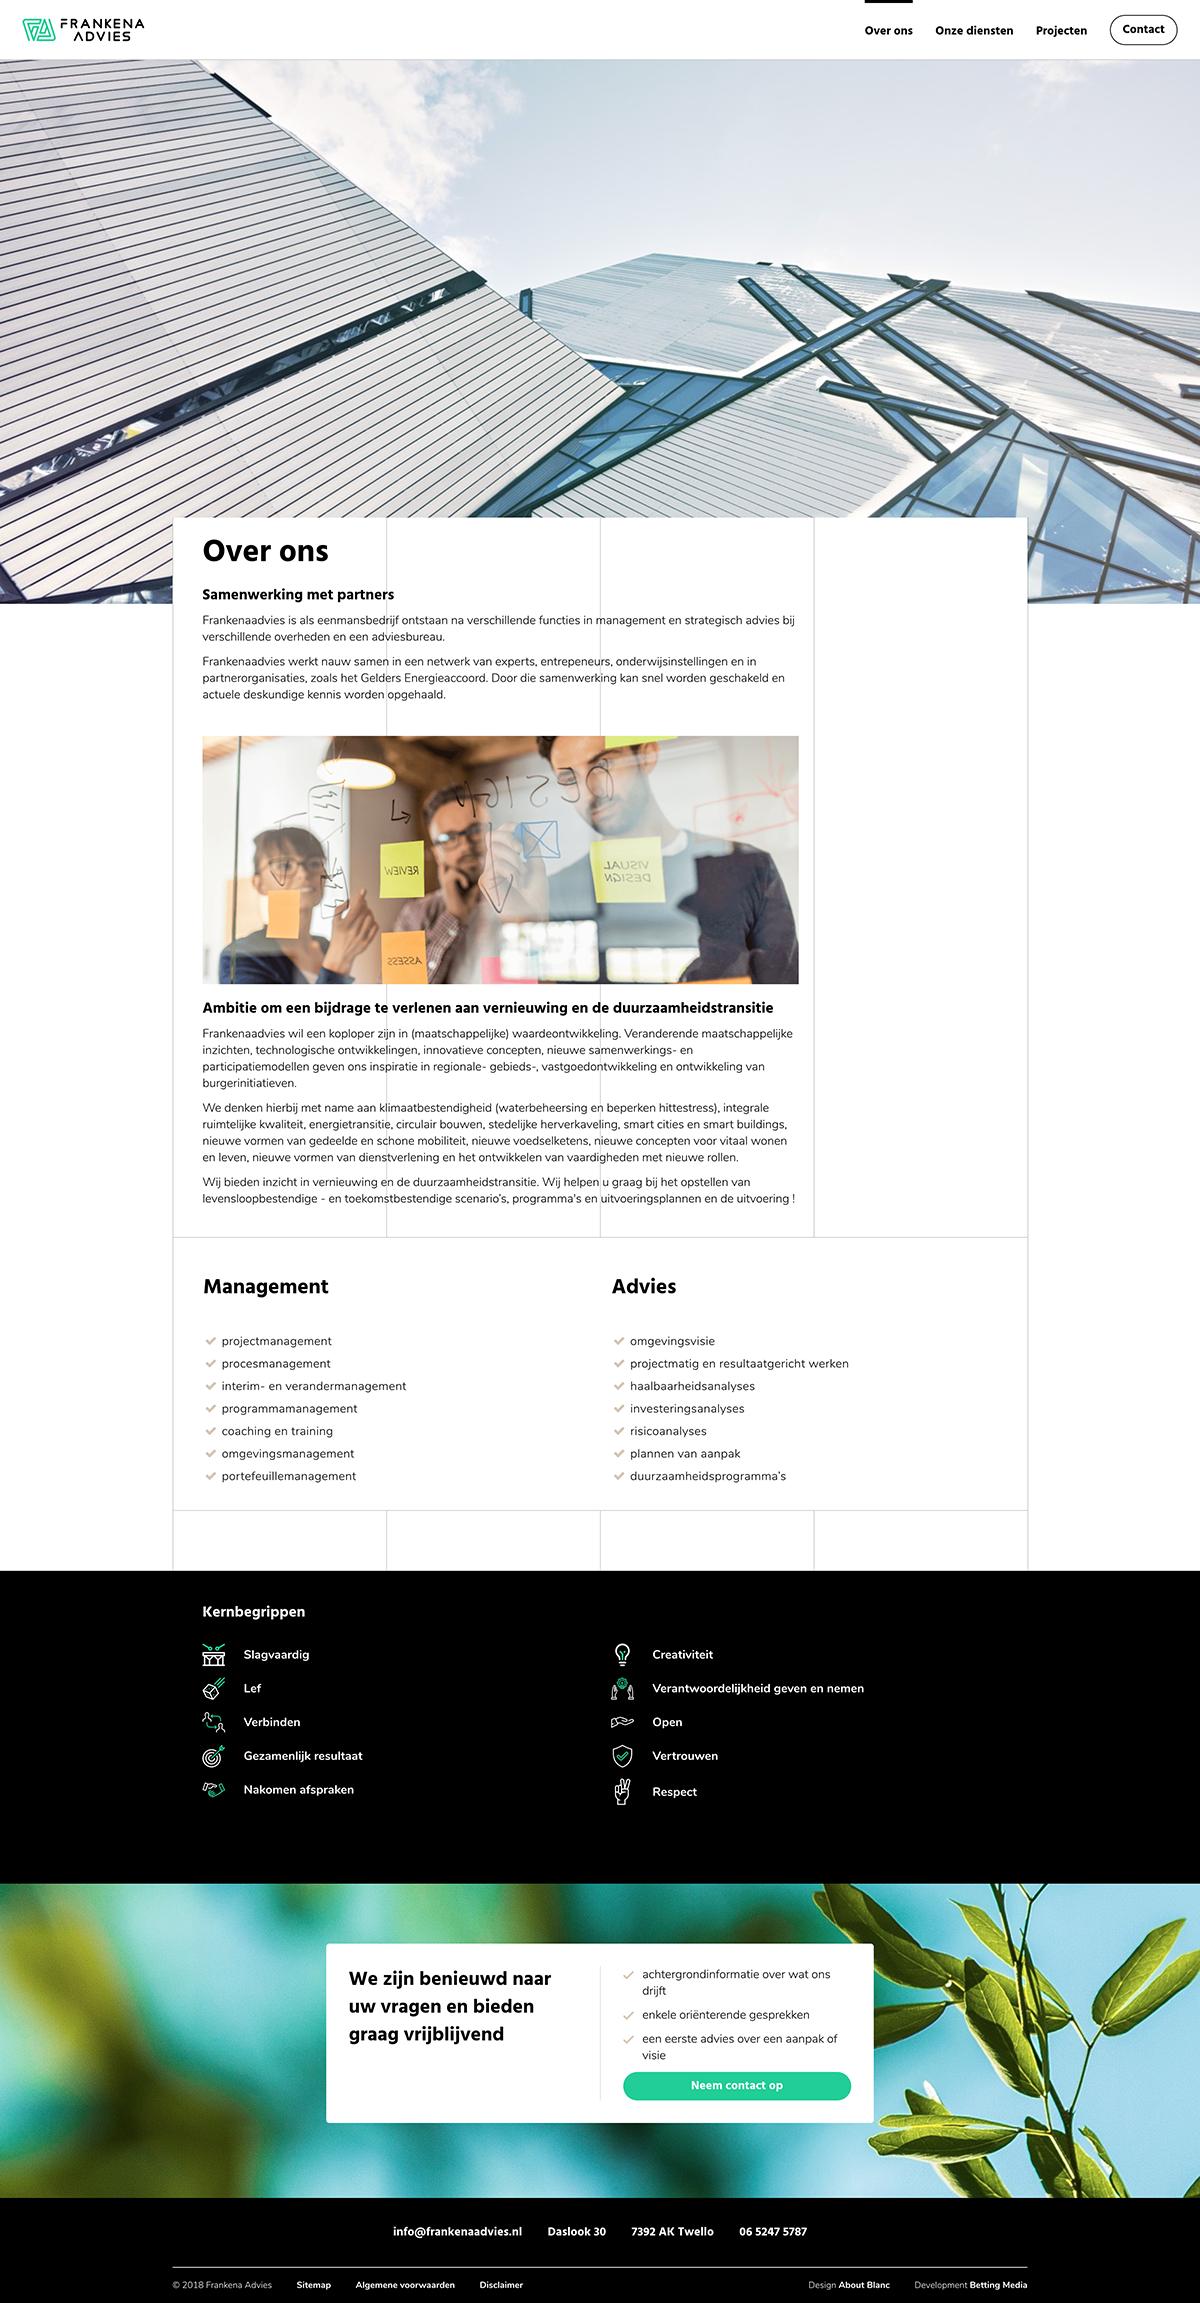 Ontwikkeling website Frankena Advies